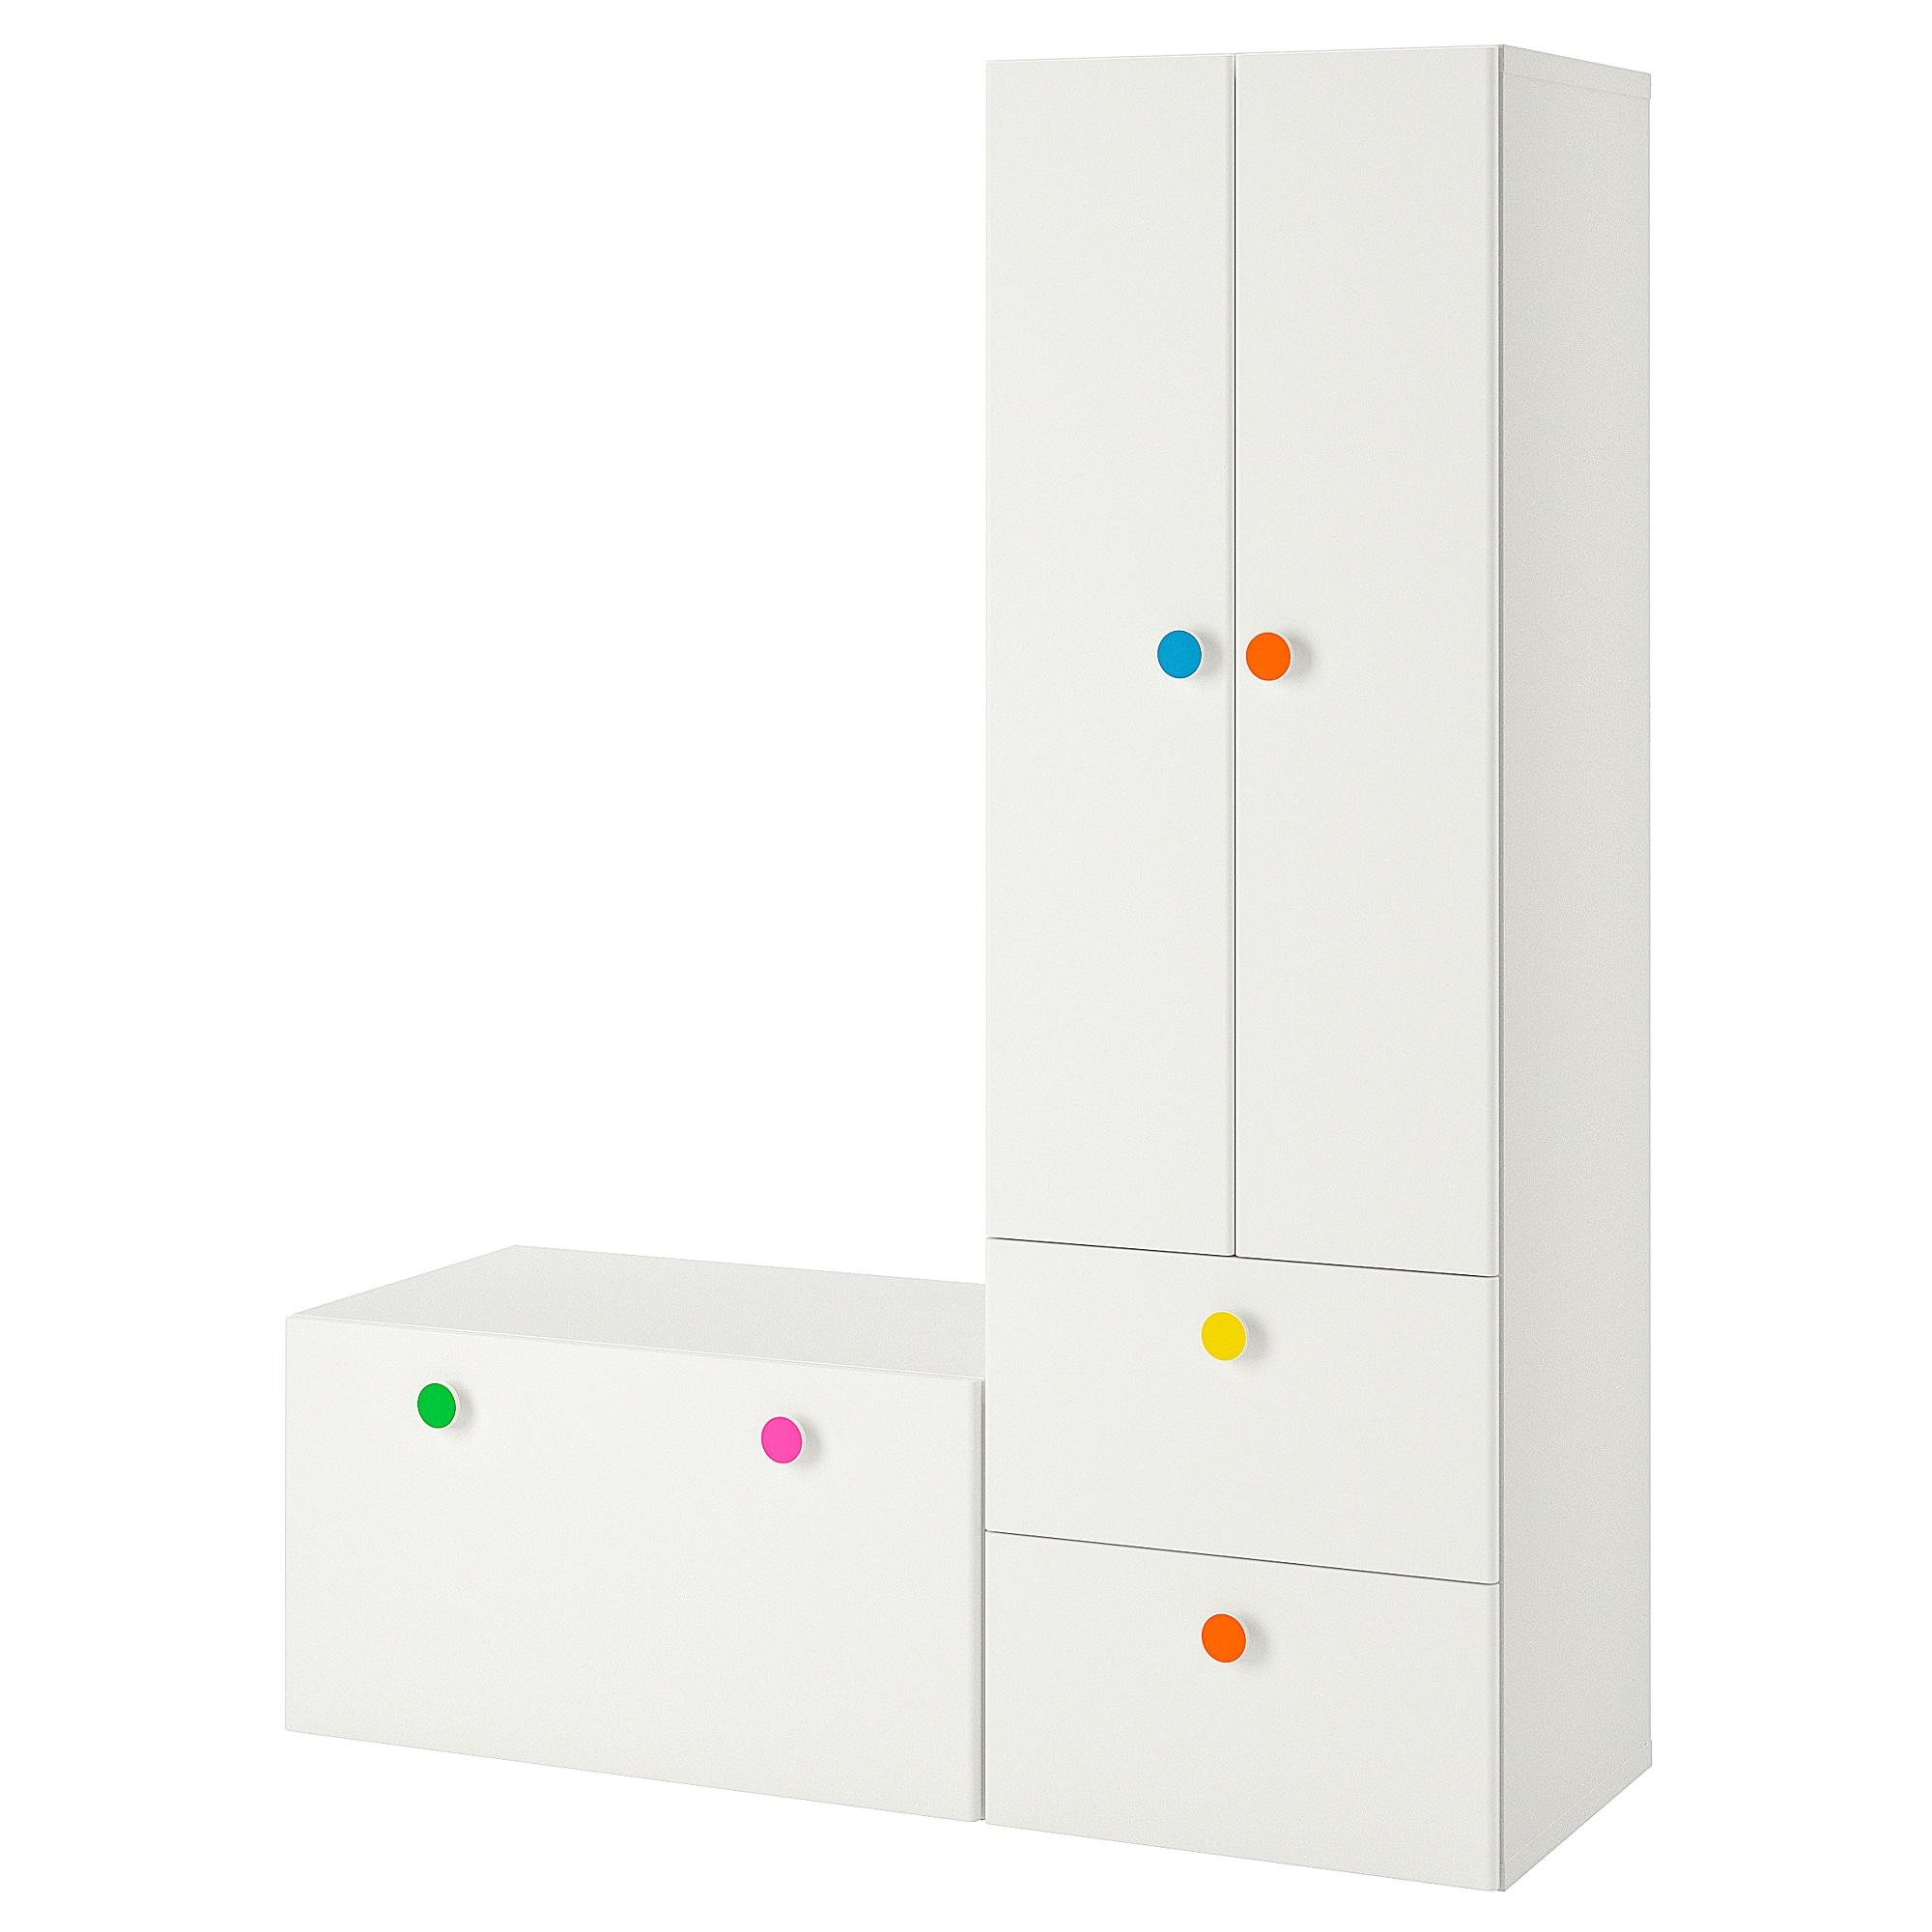 Stuva Folja Storage Combination With Bench White 59x19 5 8x75